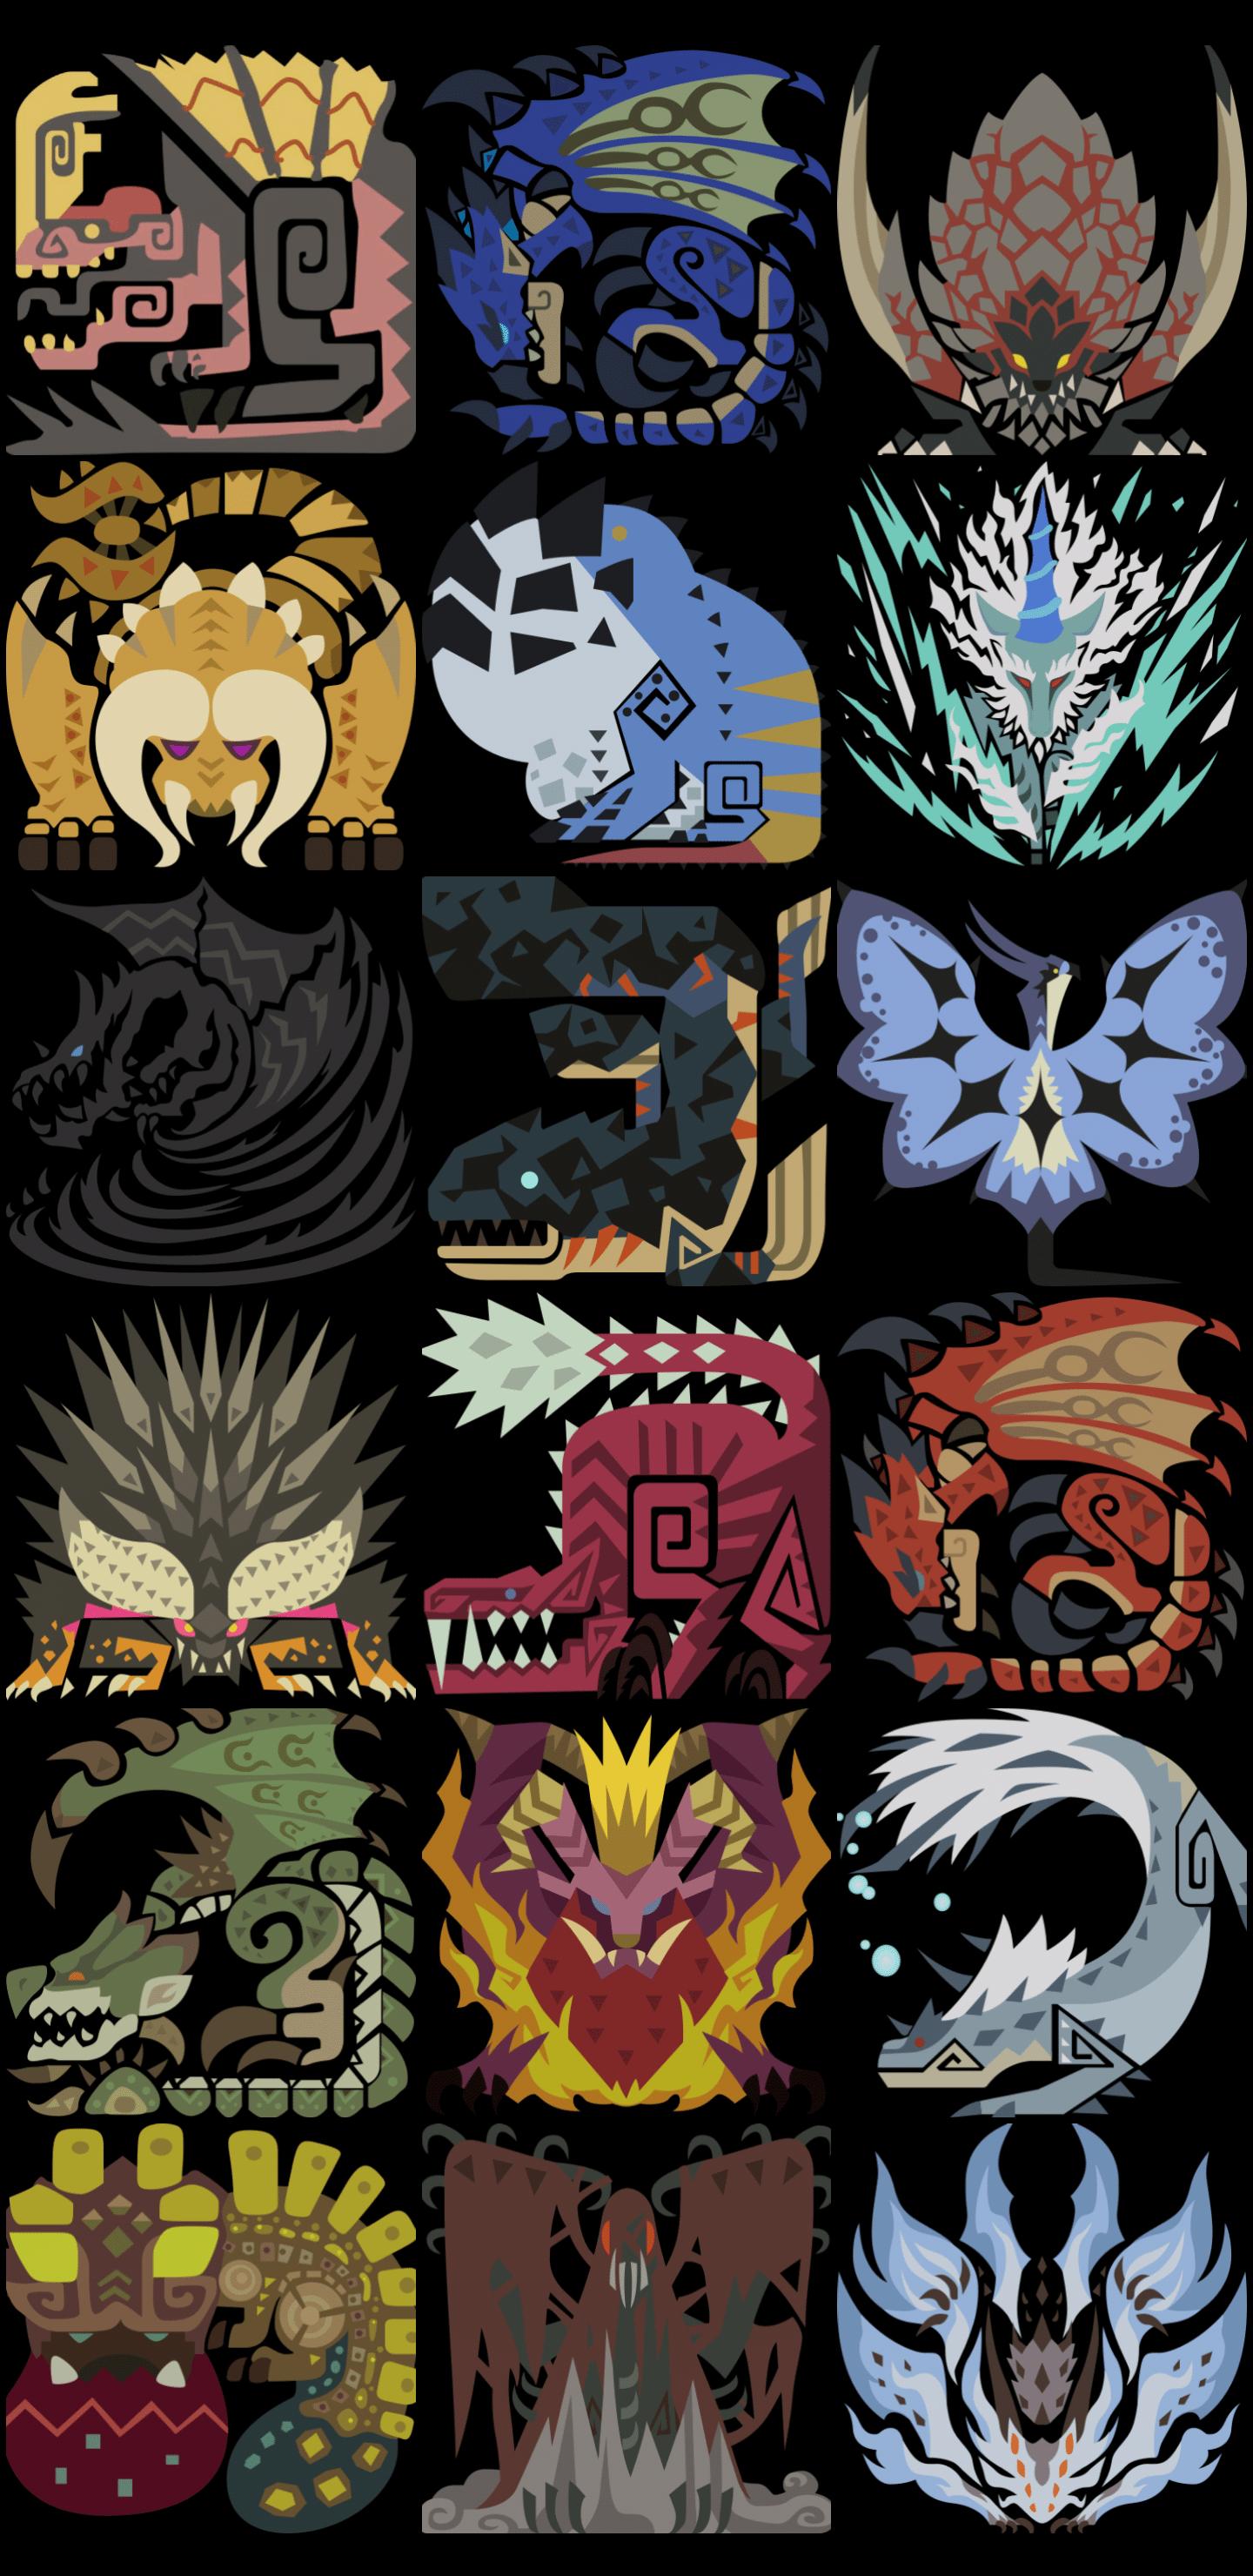 Monster Hunter Iphone Wallpapers Top Free Monster Hunter Iphone